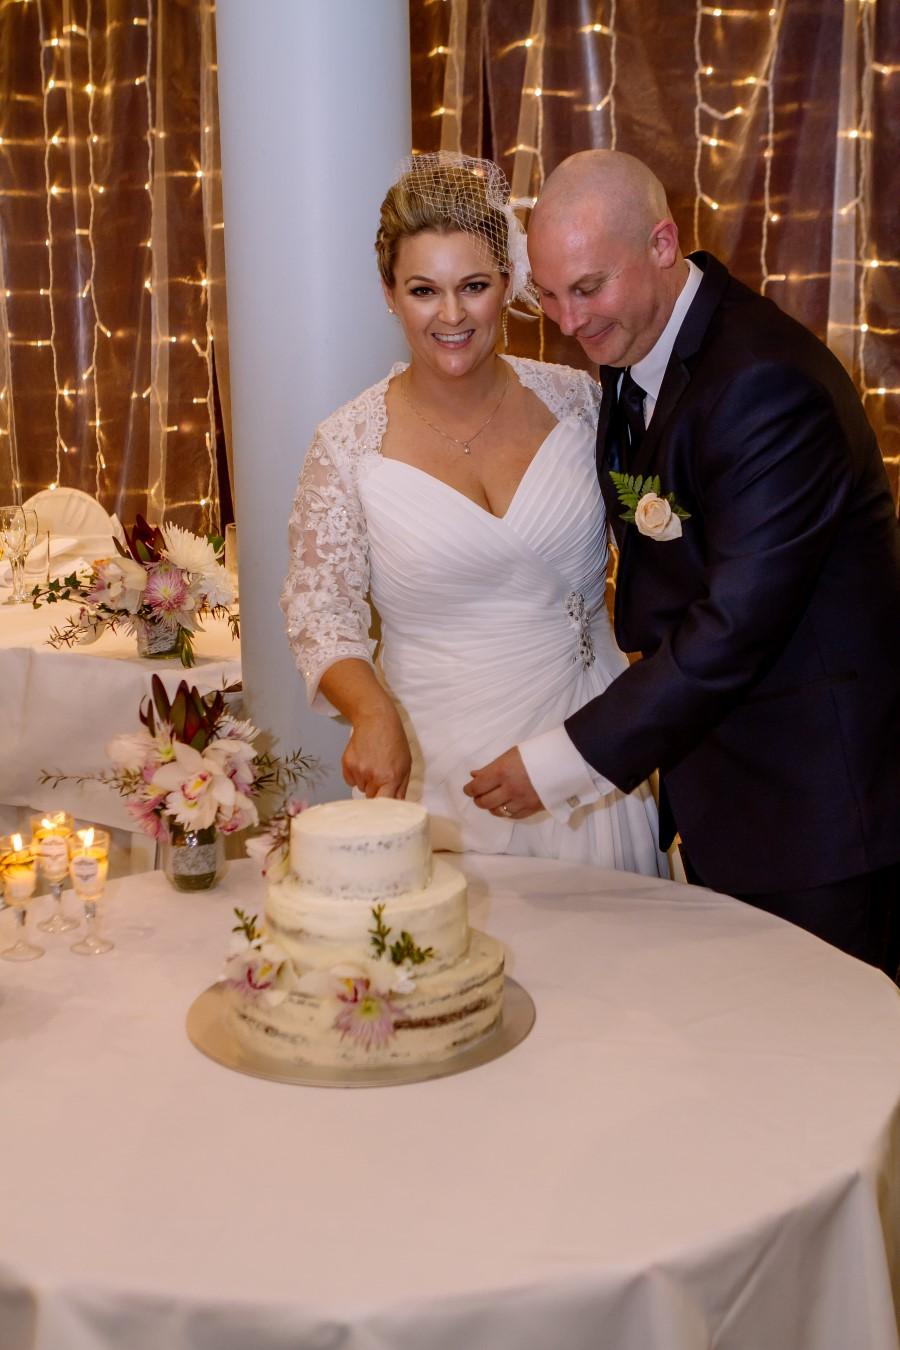 nz_wedding_st_leonards_mchughs-1090